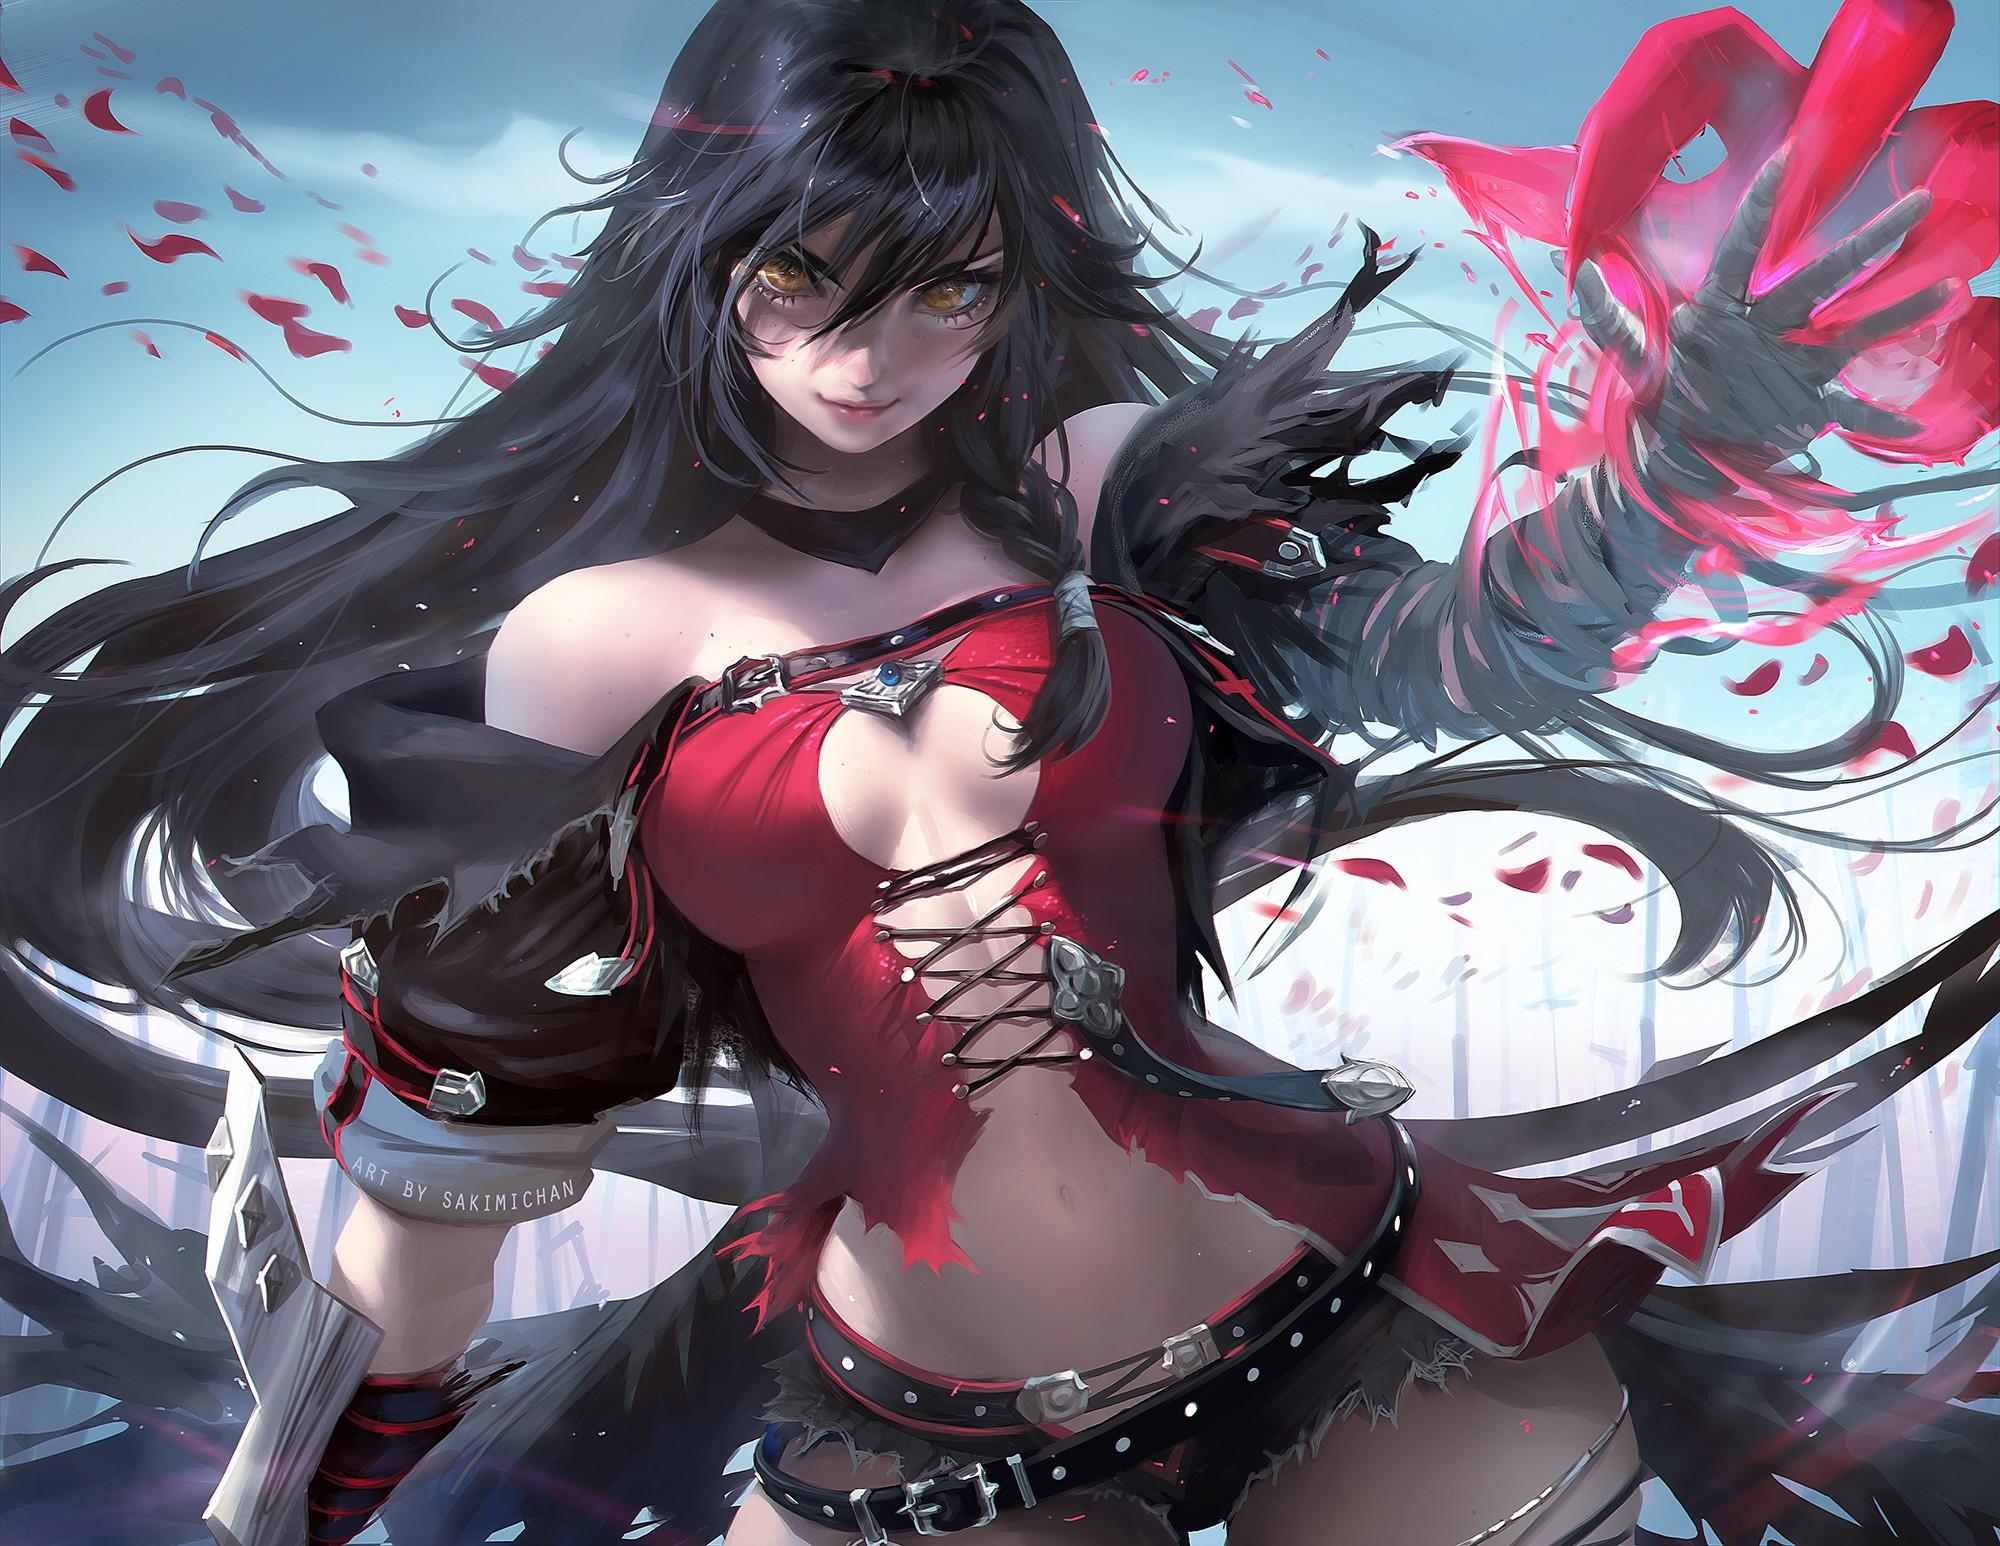 Anime 2000x1546 Tales of Berseria Velvet Crowe long hair black hair torn clothes cleavage realistic Sakimichan Tales of Series gray lingerie